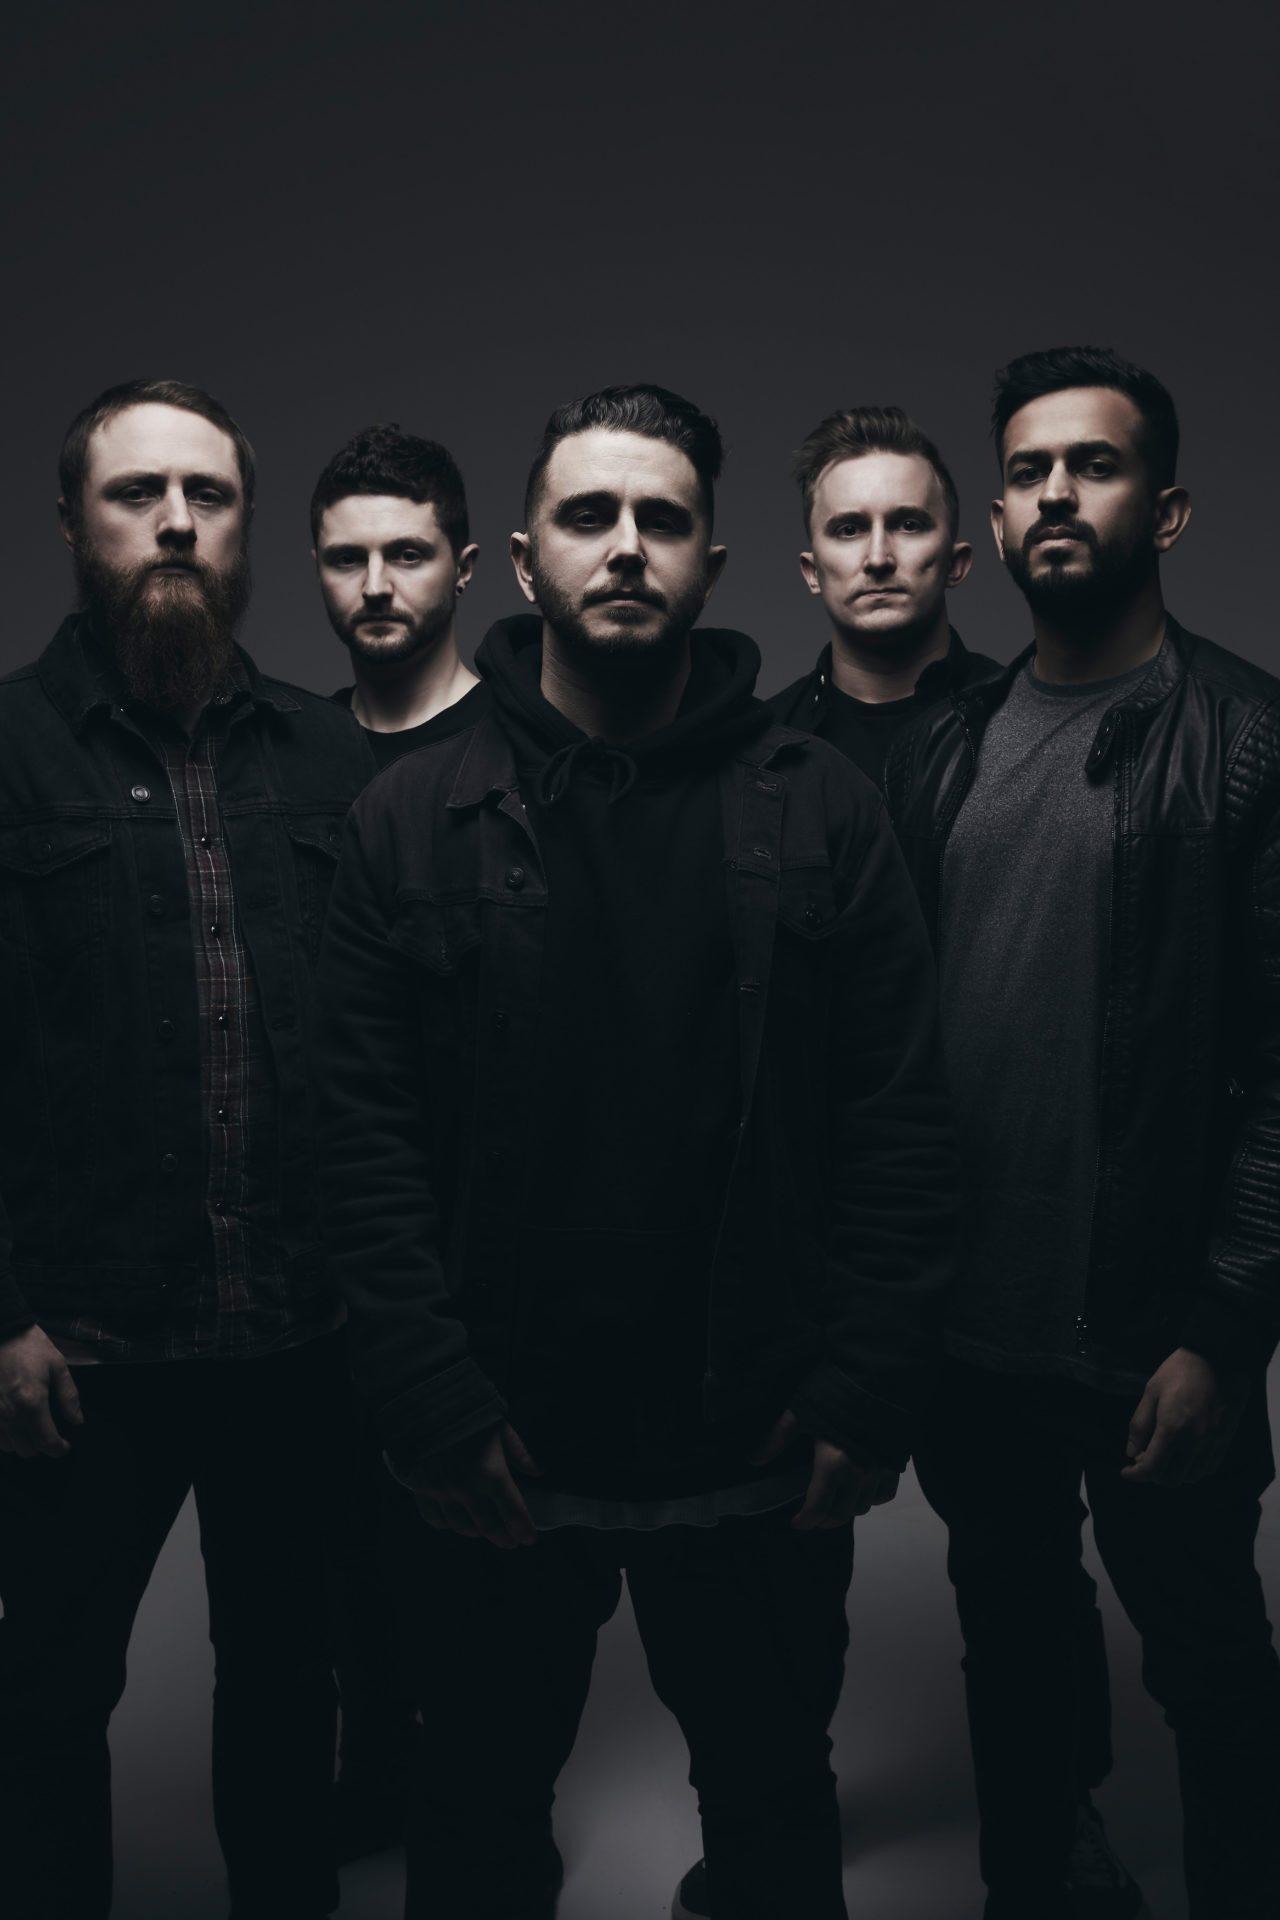 Heart Of A Coward - Band